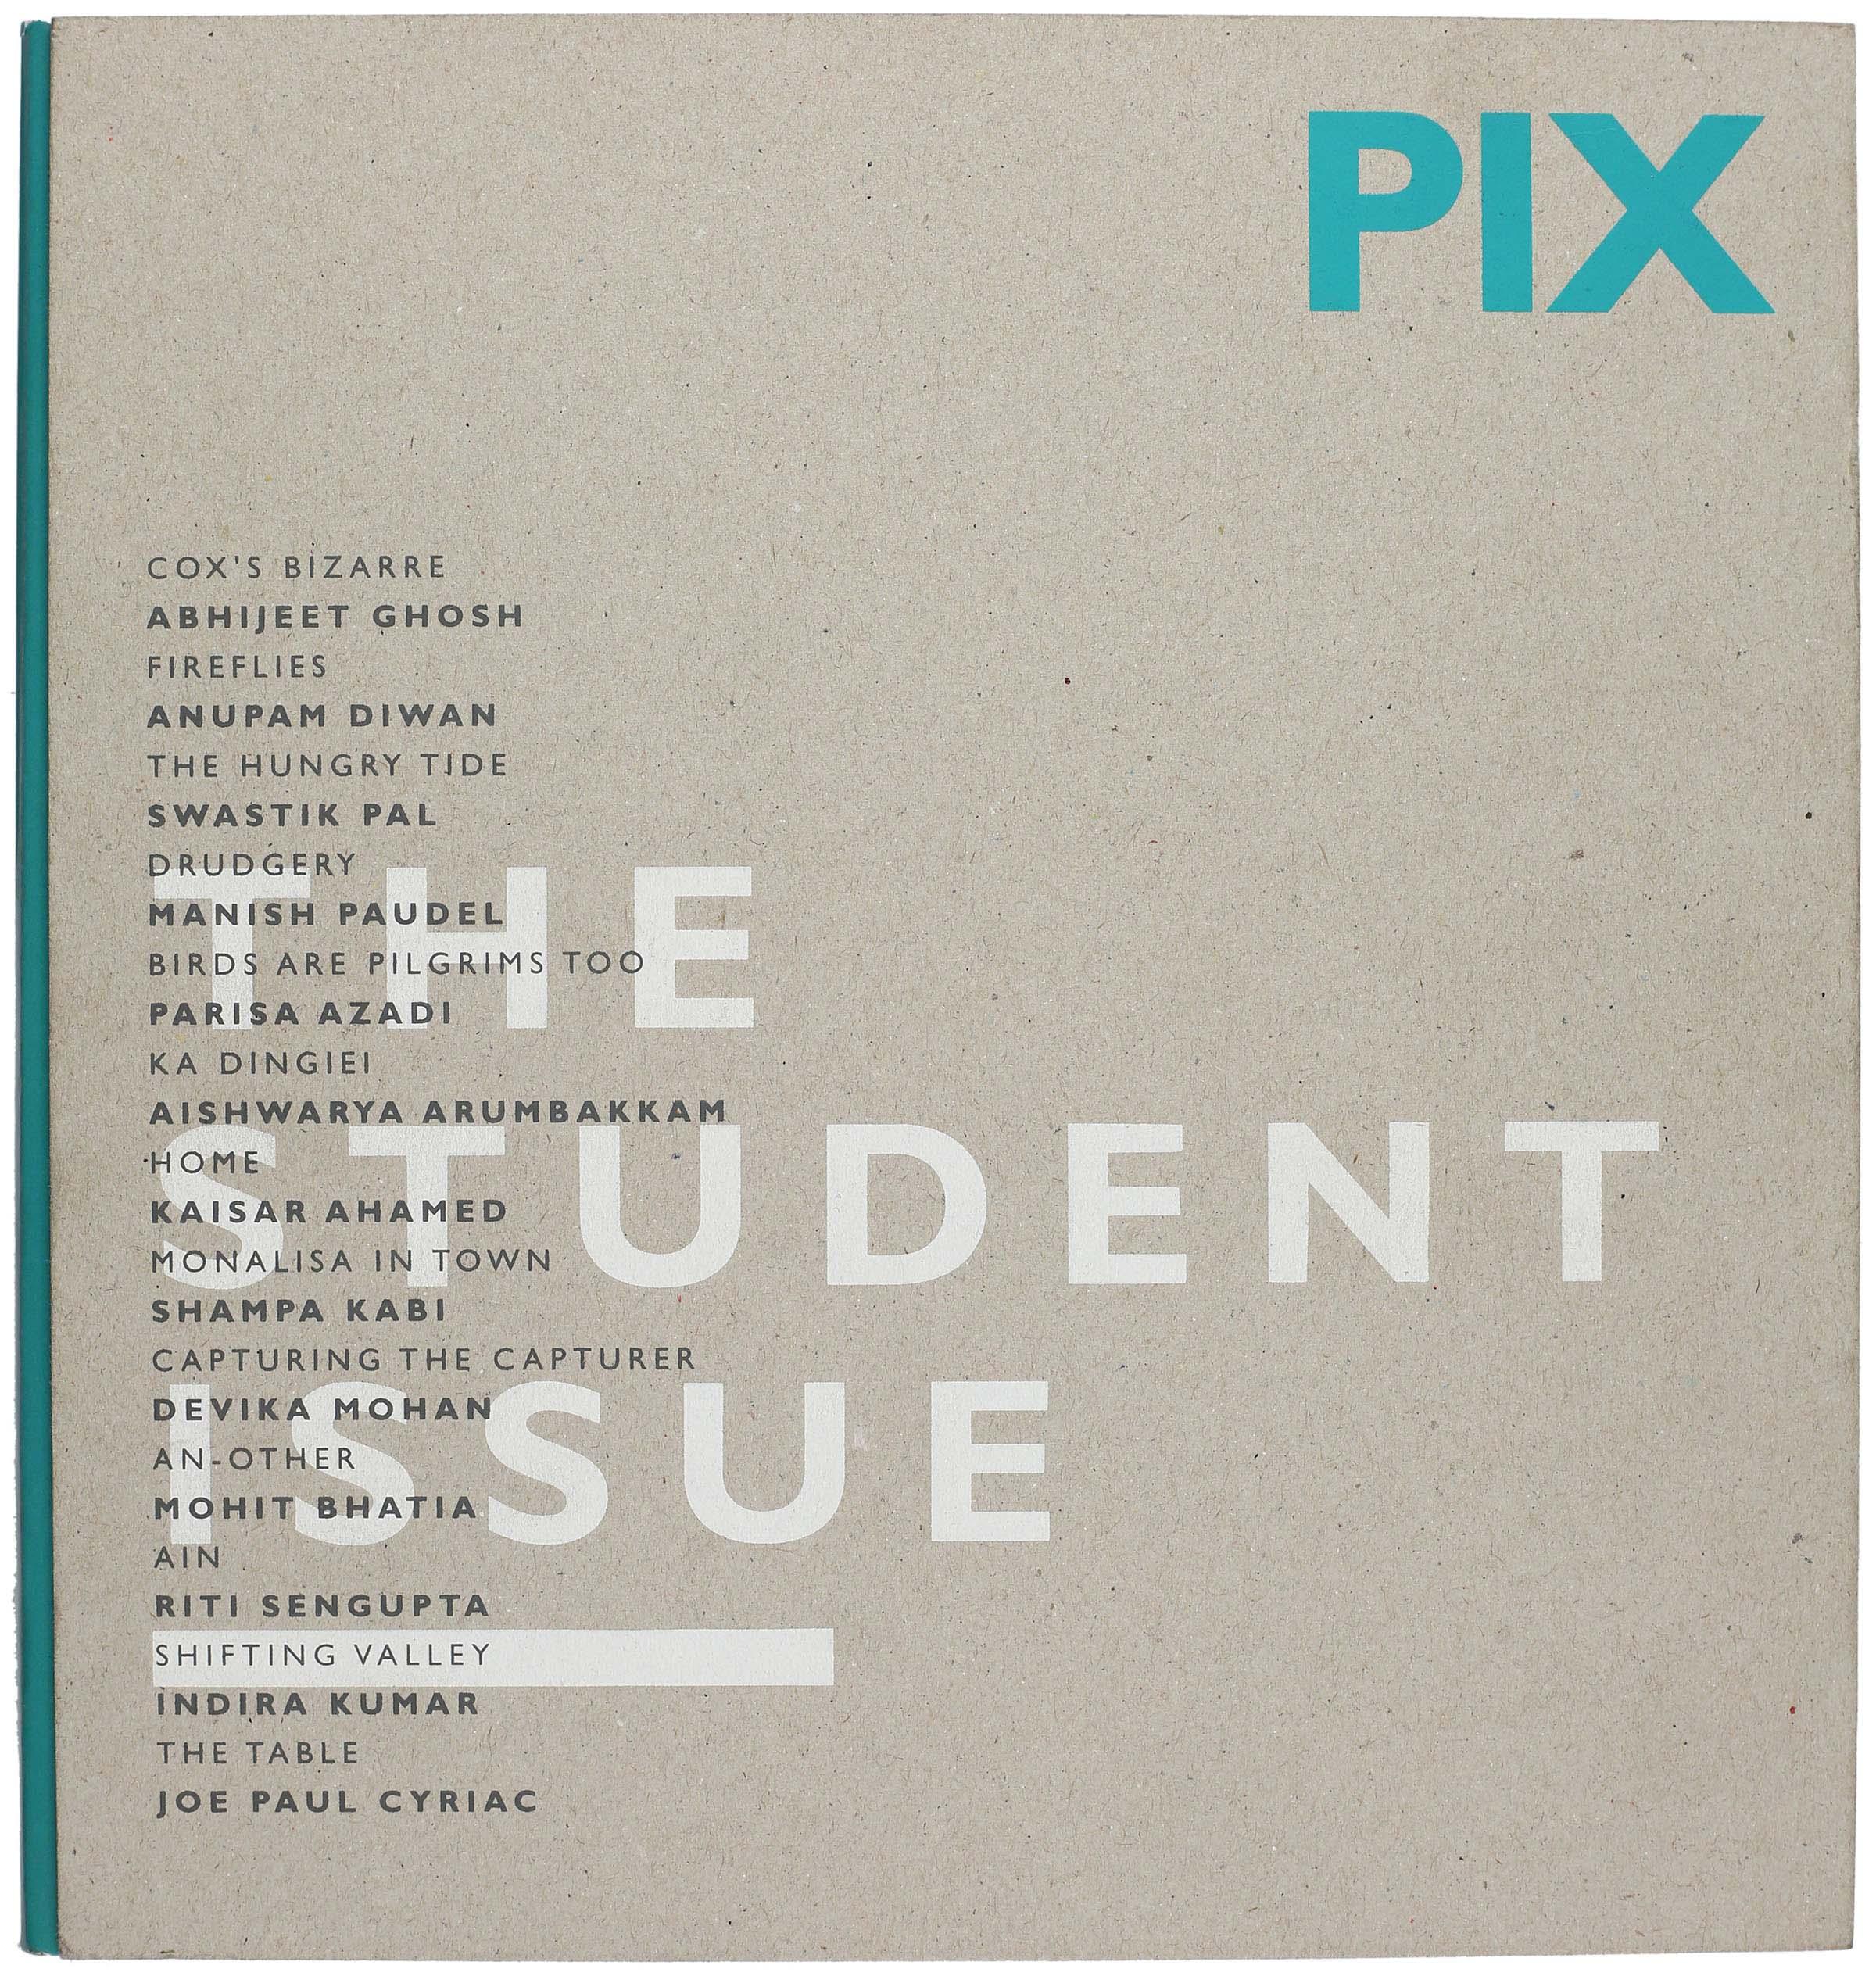 PIX current issue